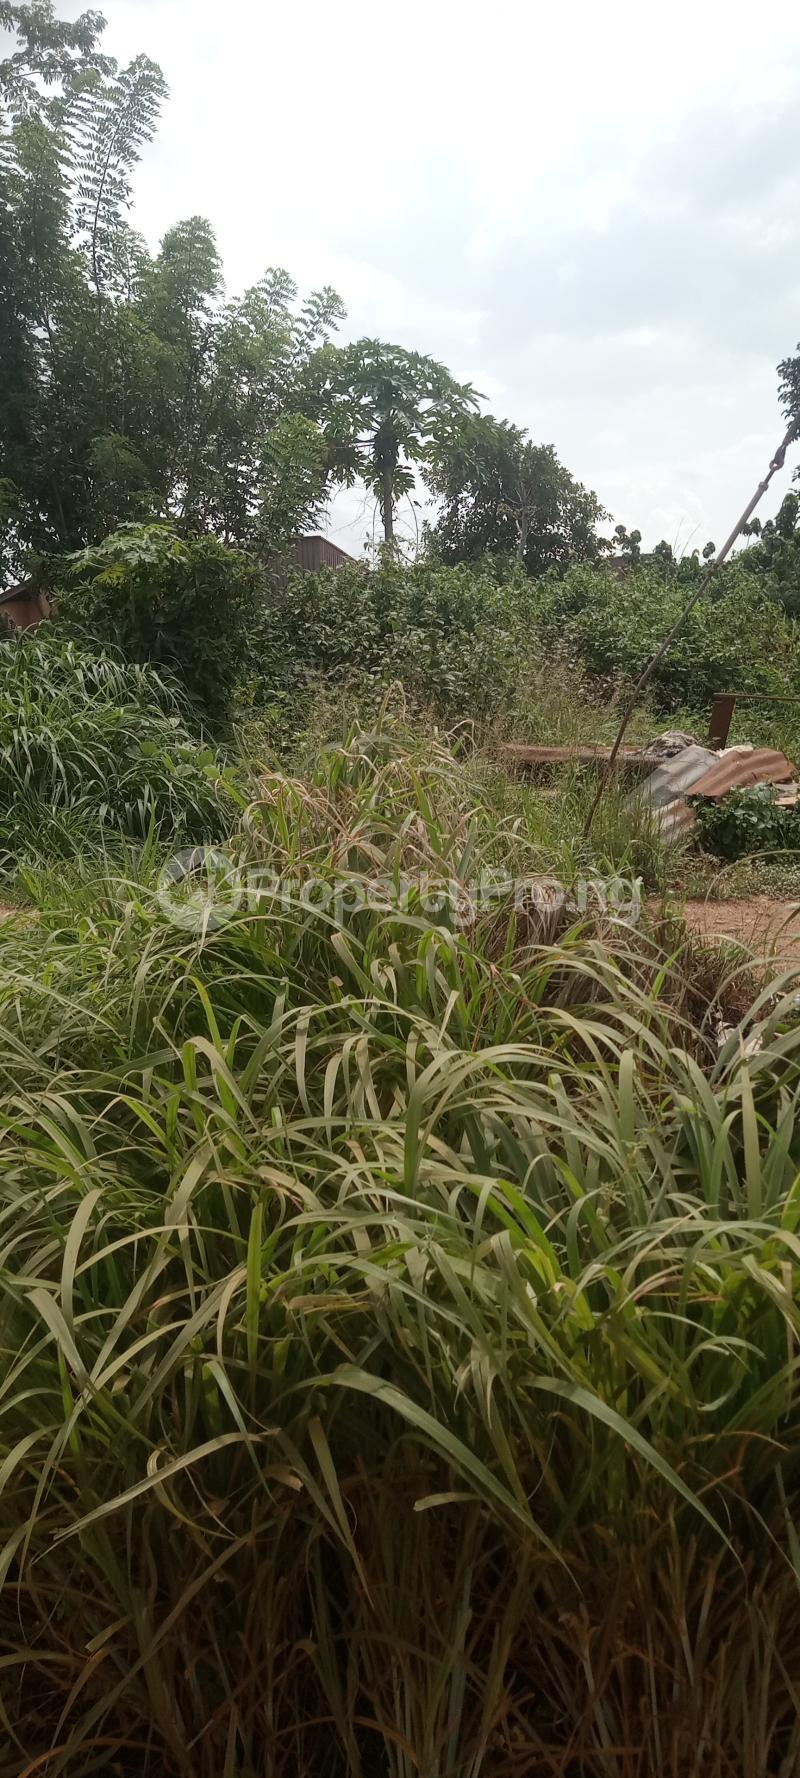 Residential Land for sale Oka, Along Stella Palace Hotel Road Ondo City Ondo West Ondo - 5